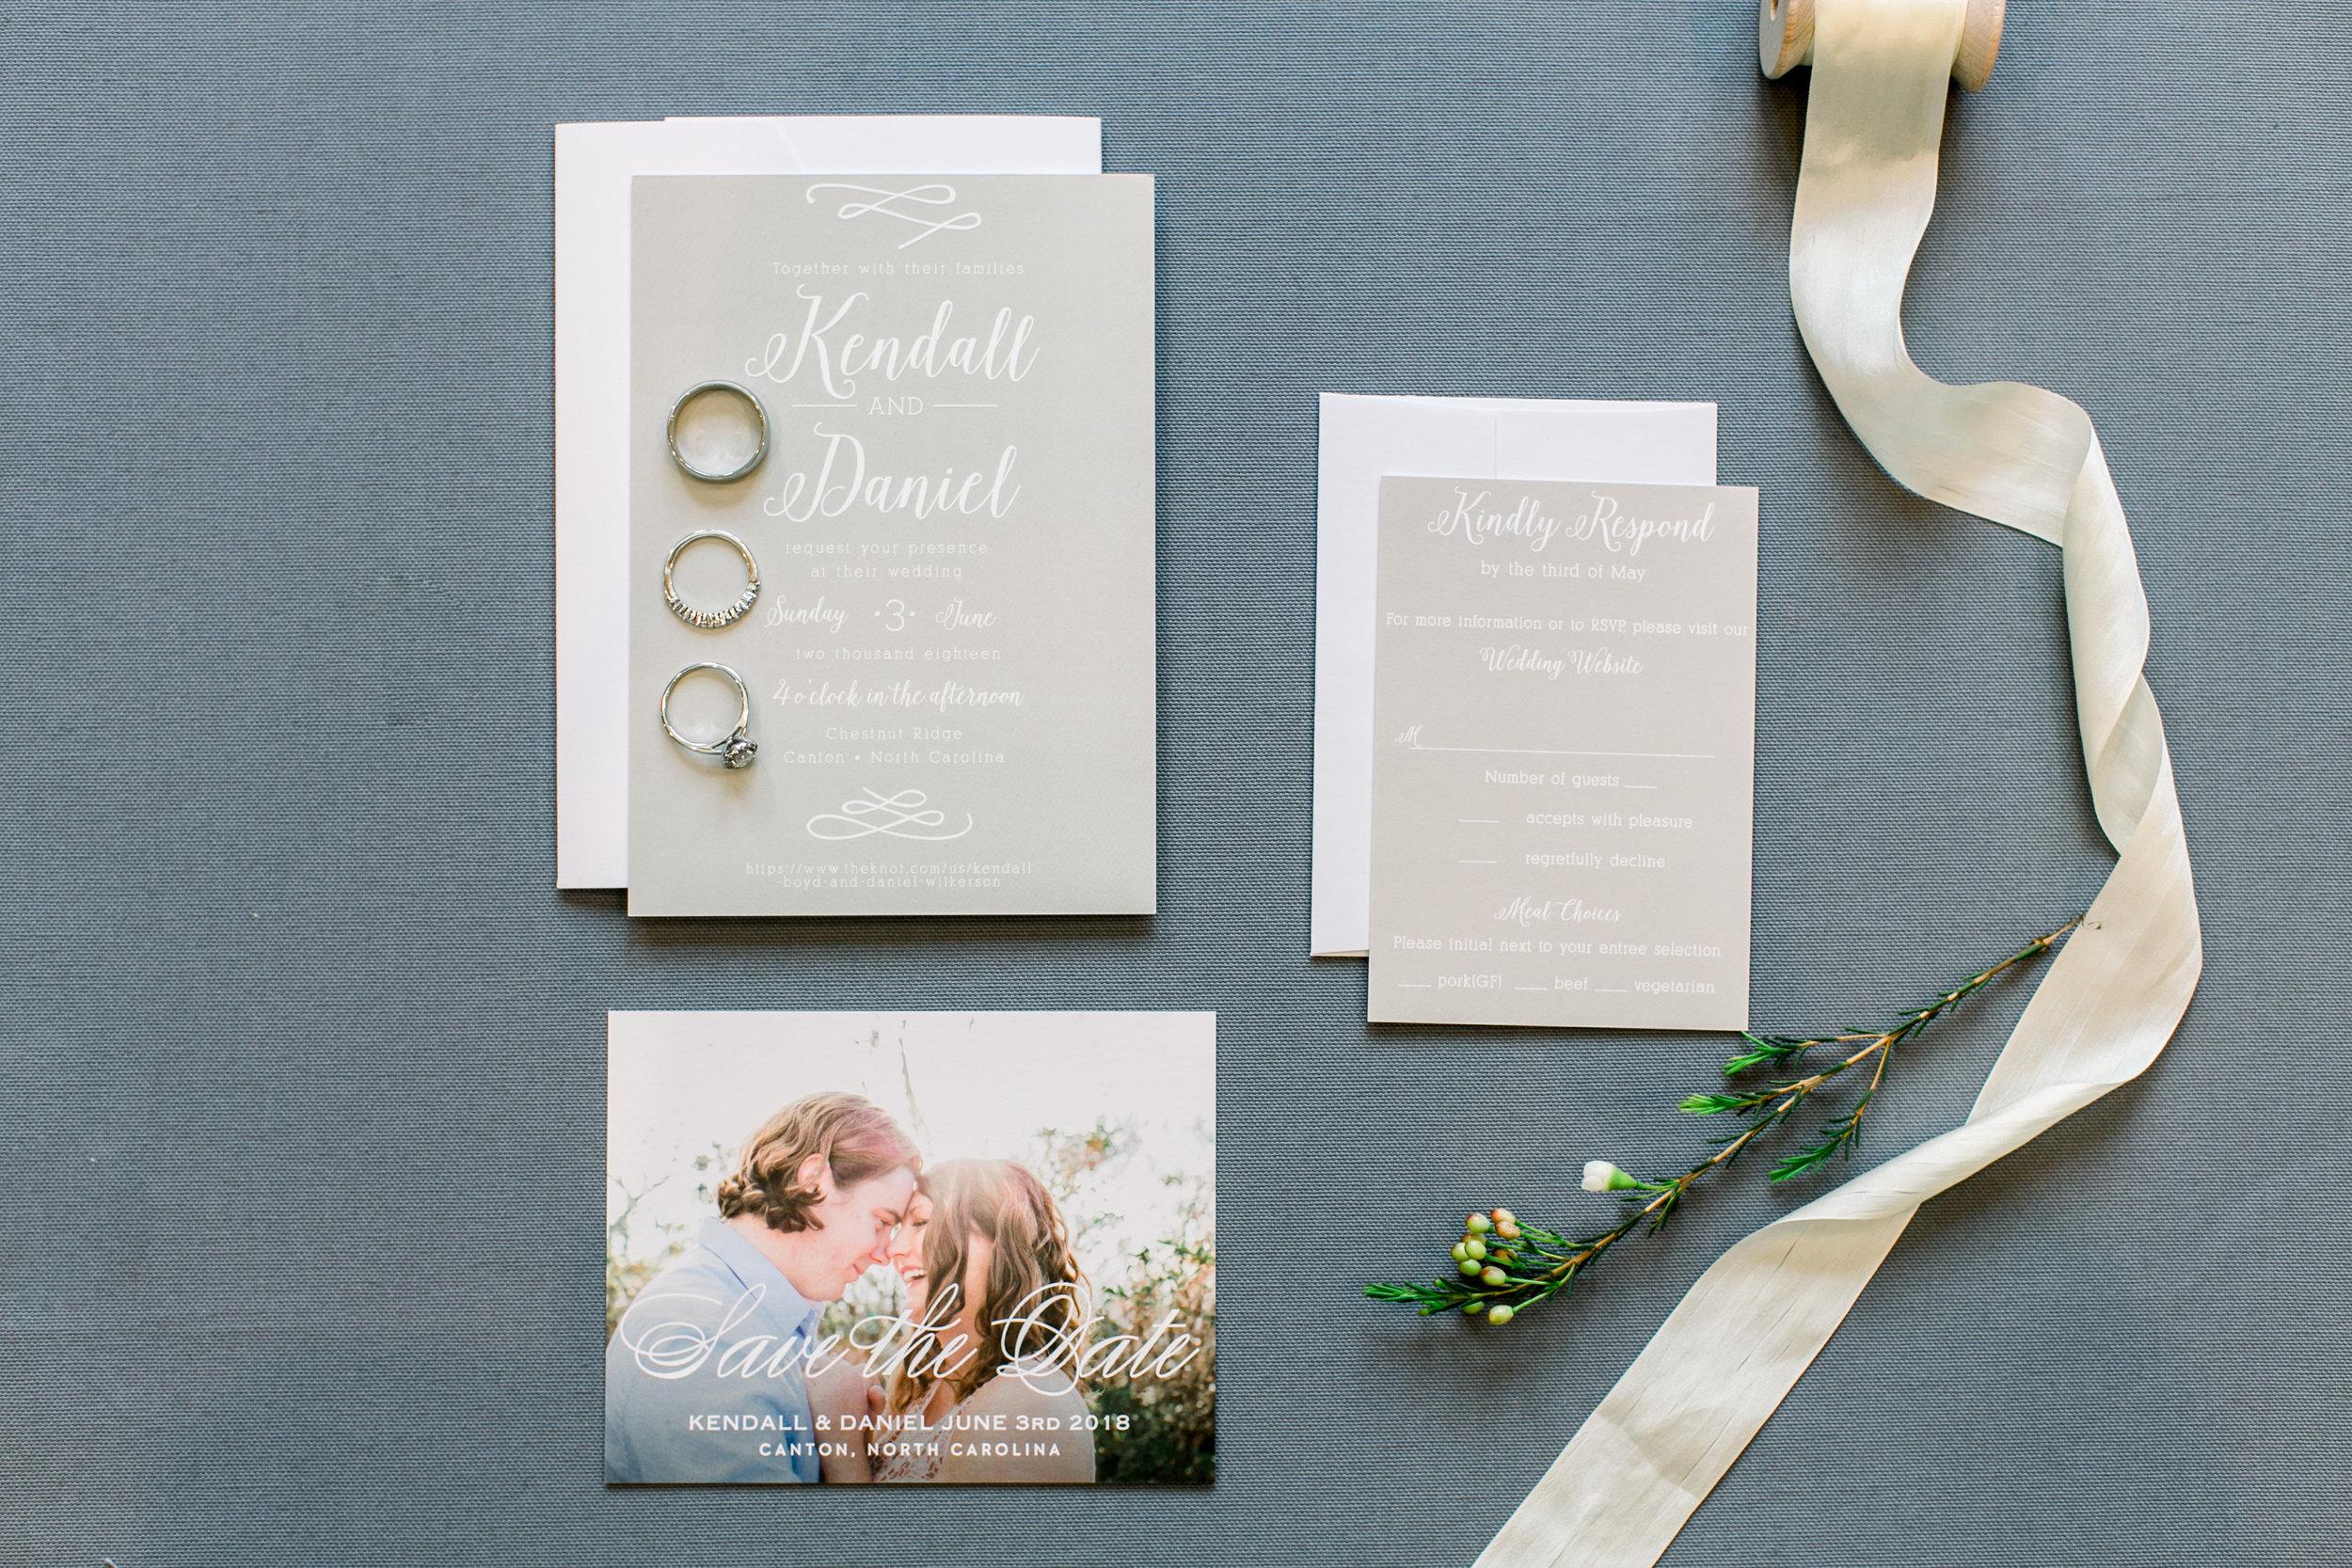 Joy-Unscripted-Wedding-Calligraphy-Kendall-1.jpg